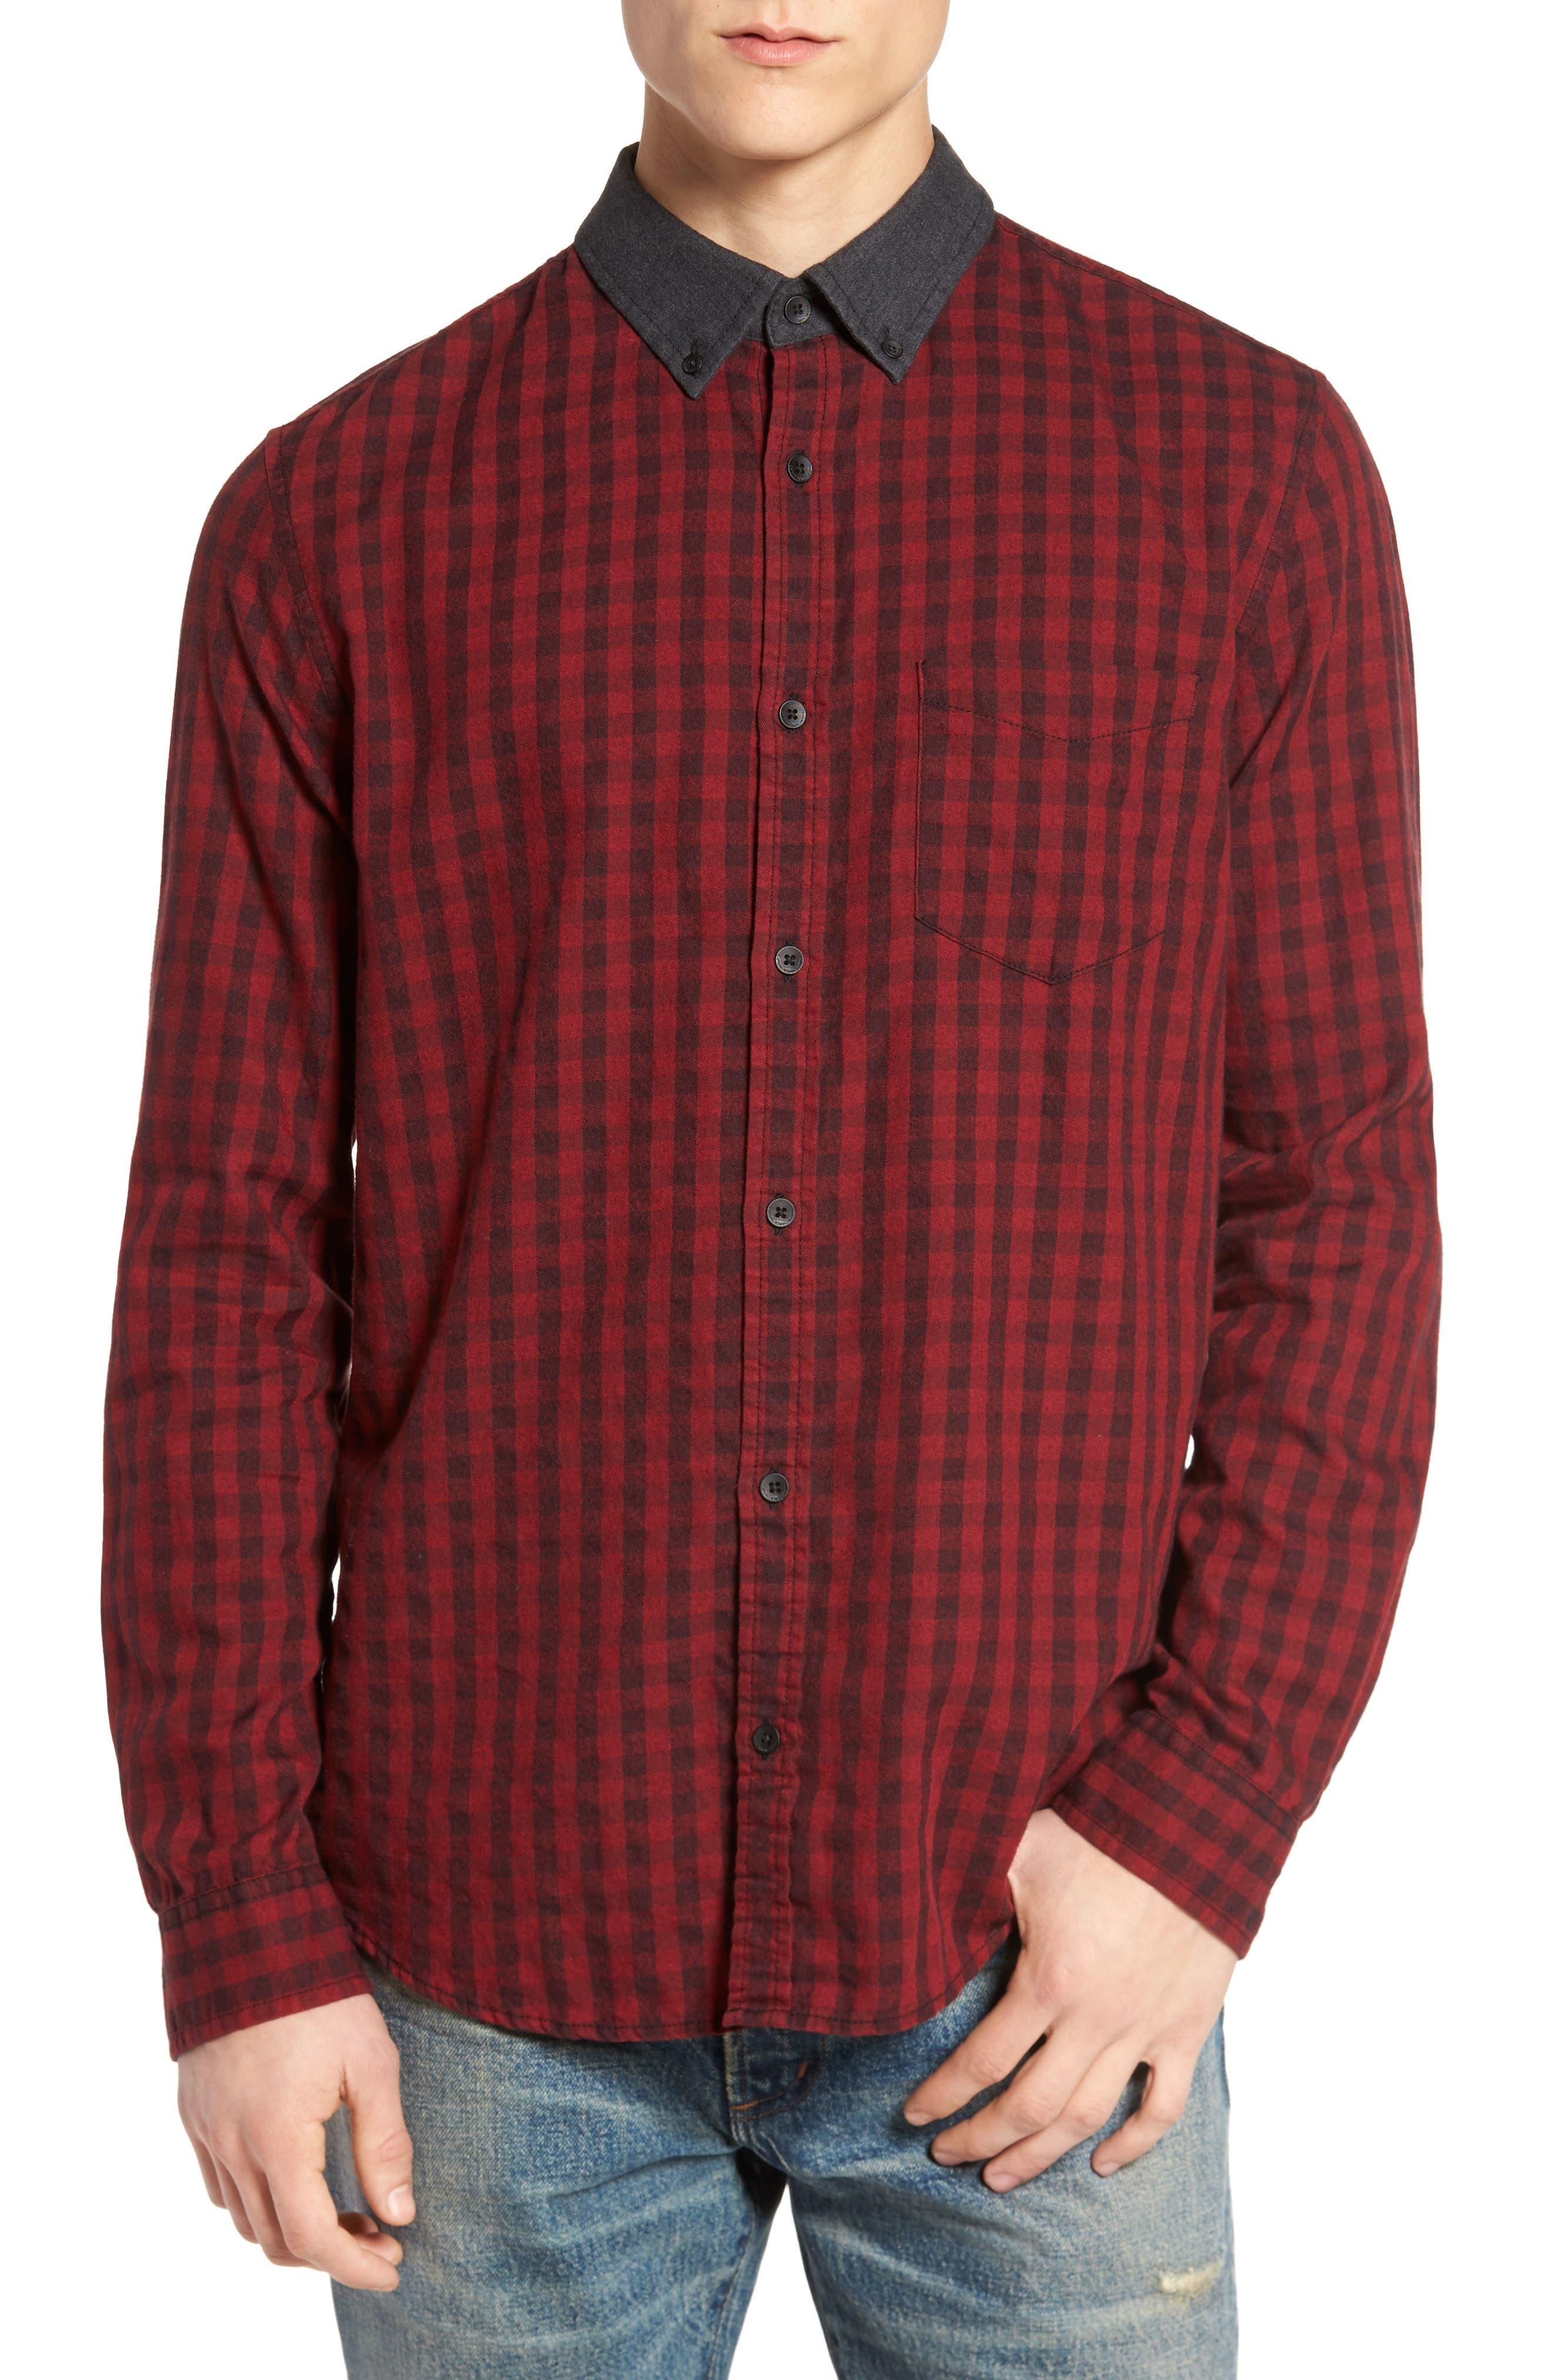 Calvin Klein: Men's Casual Button-Down Shirts Clothing & Shoes ...